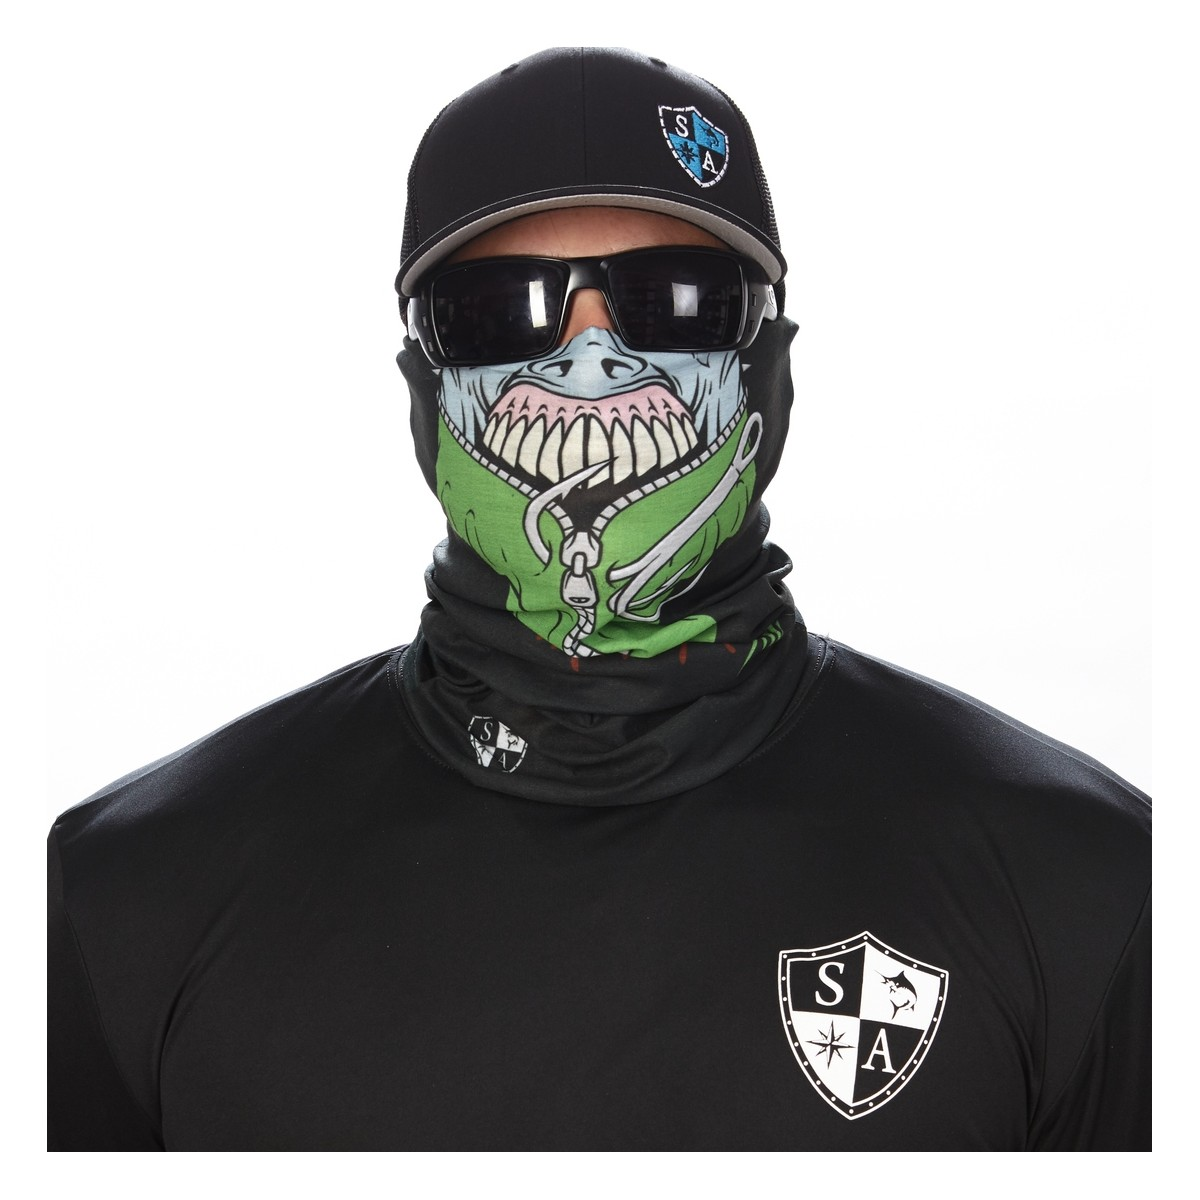 Zip Face Shield